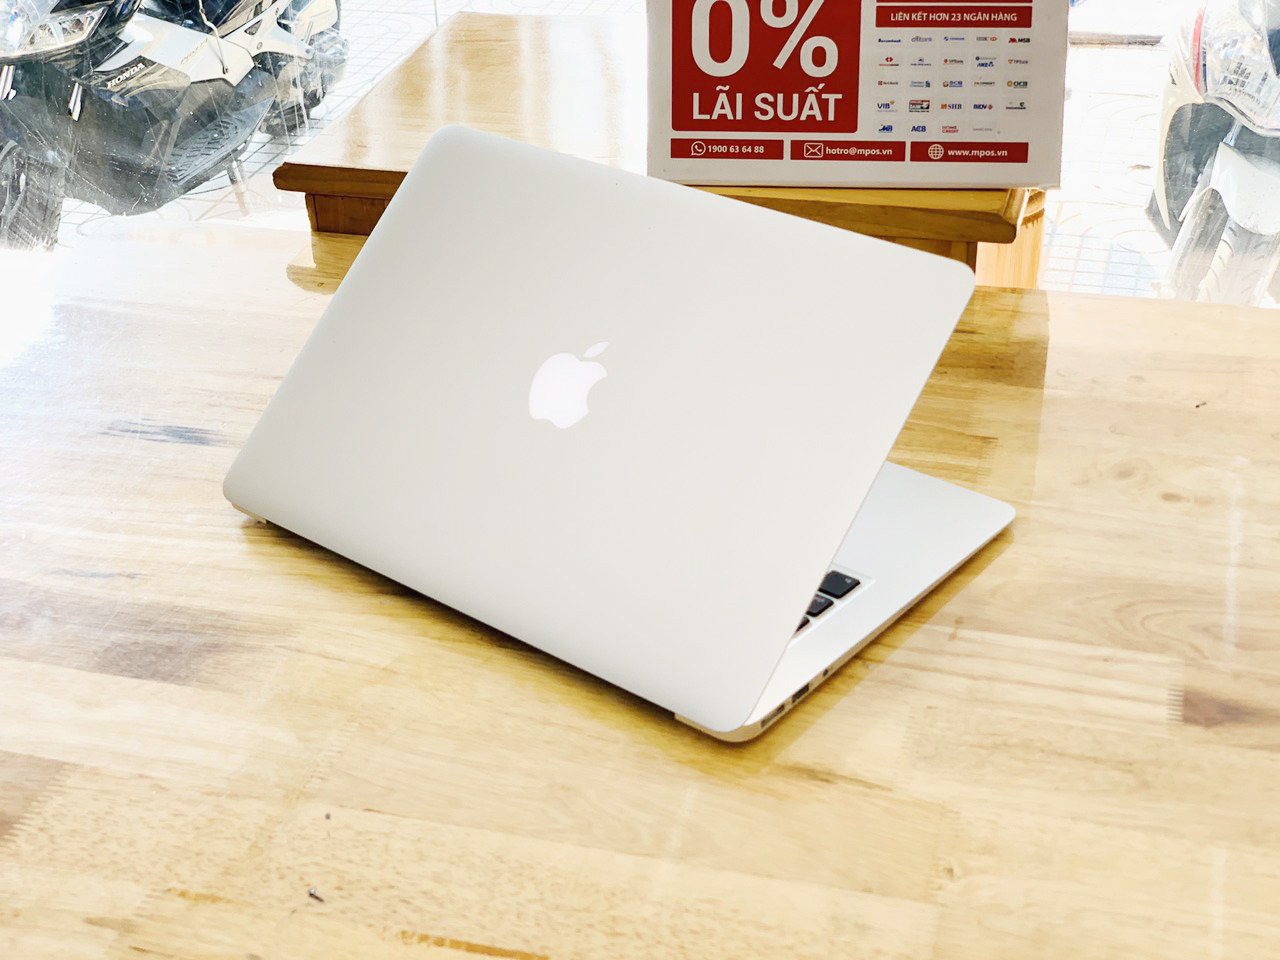 Macbook Air 13-inch Early 2014 i7